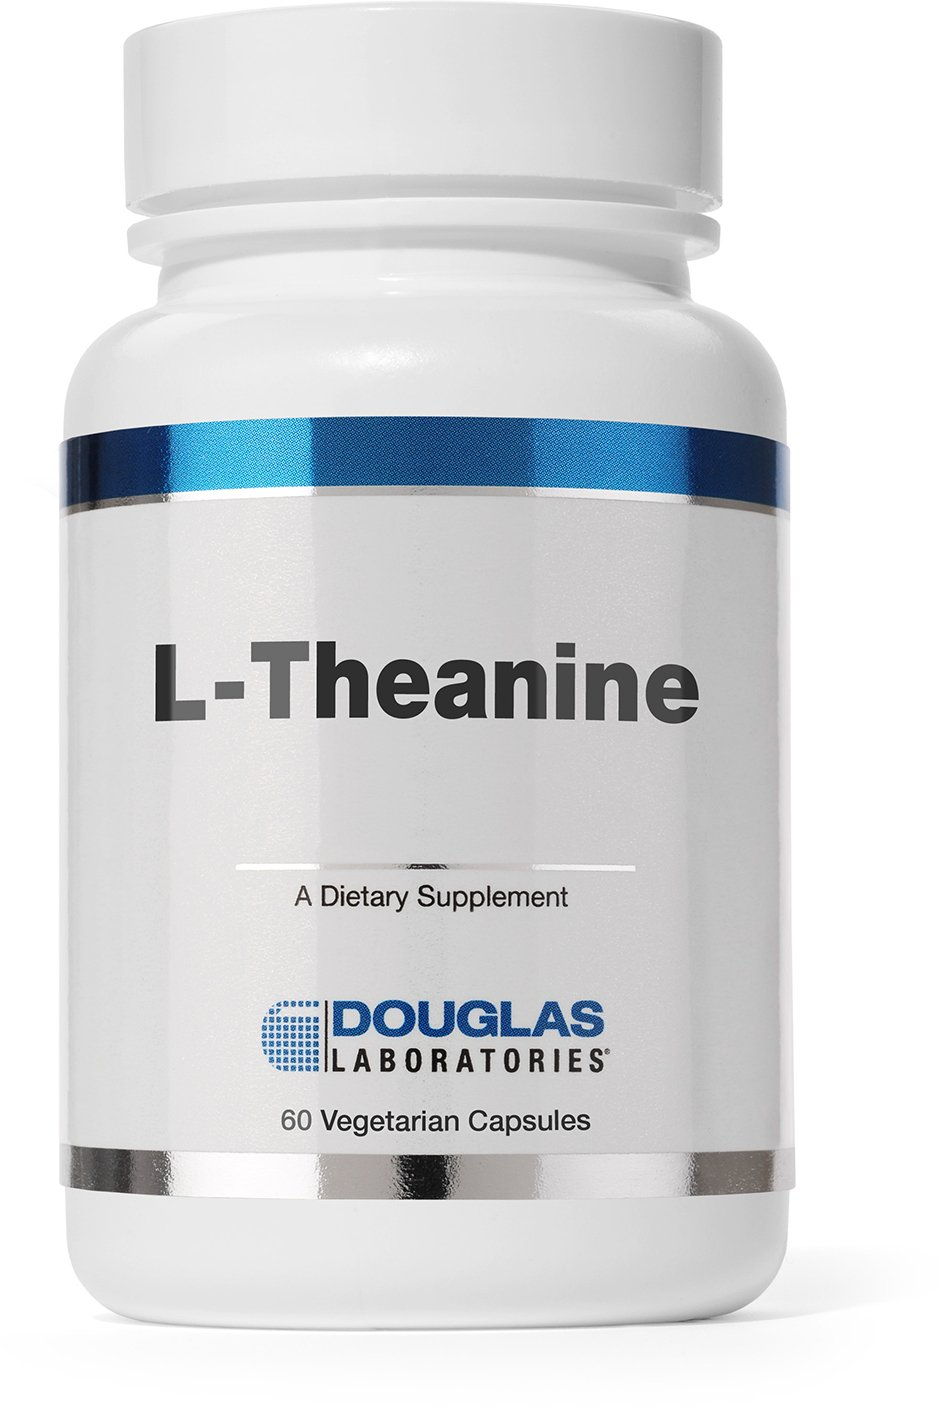 Douglas Laboratories® - L-Theanine - Promotes a Feeling of Calmness* - 60 Capsules